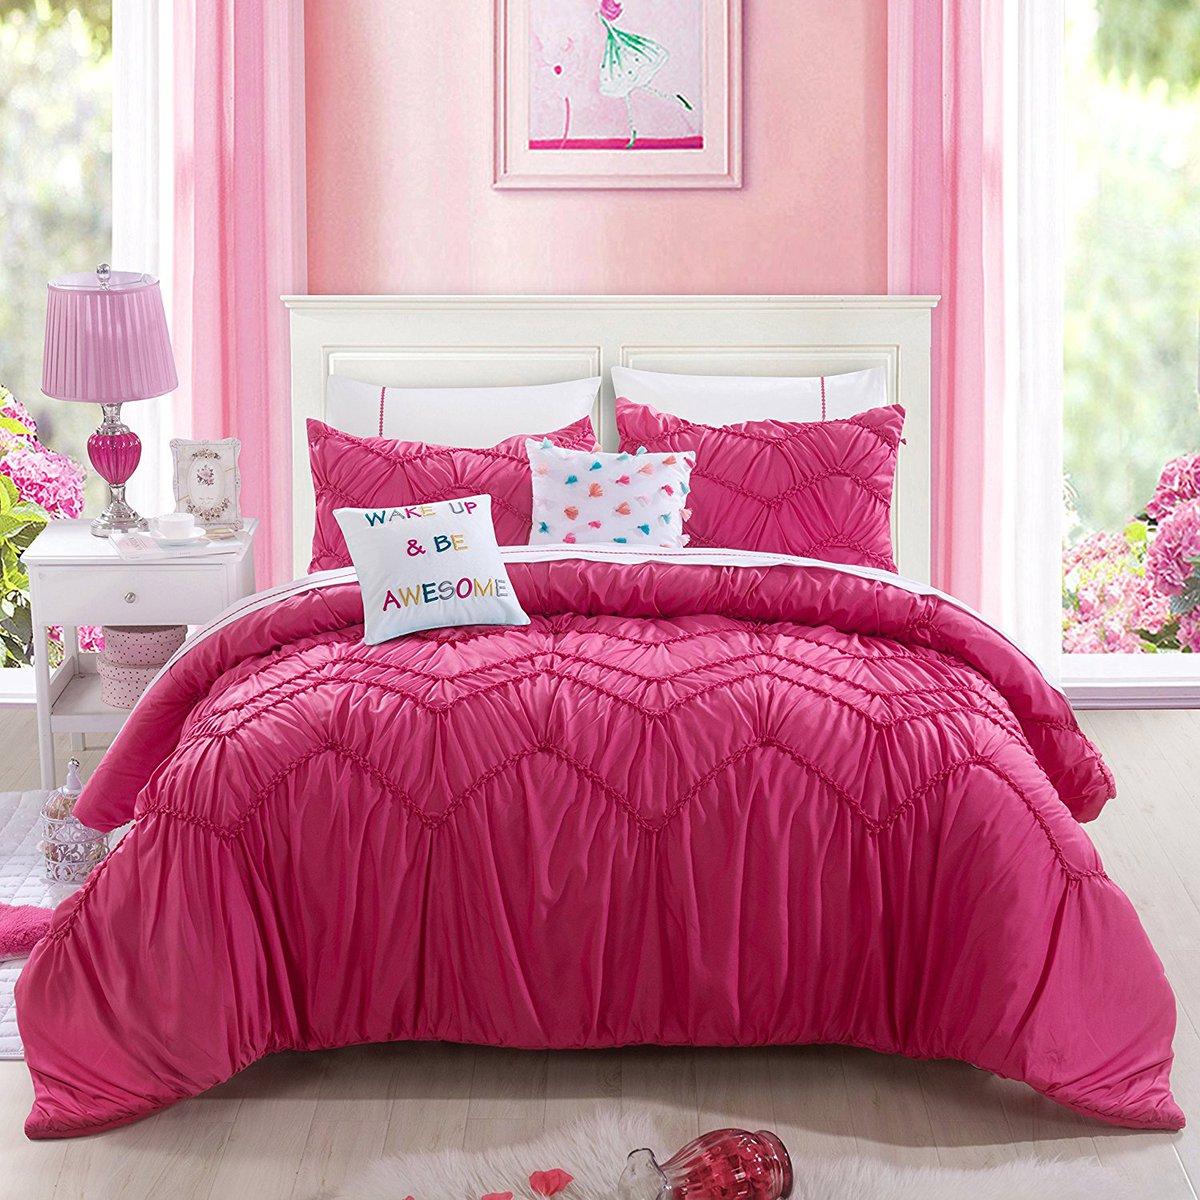 Twin bedding for teen, elissa xxx sex